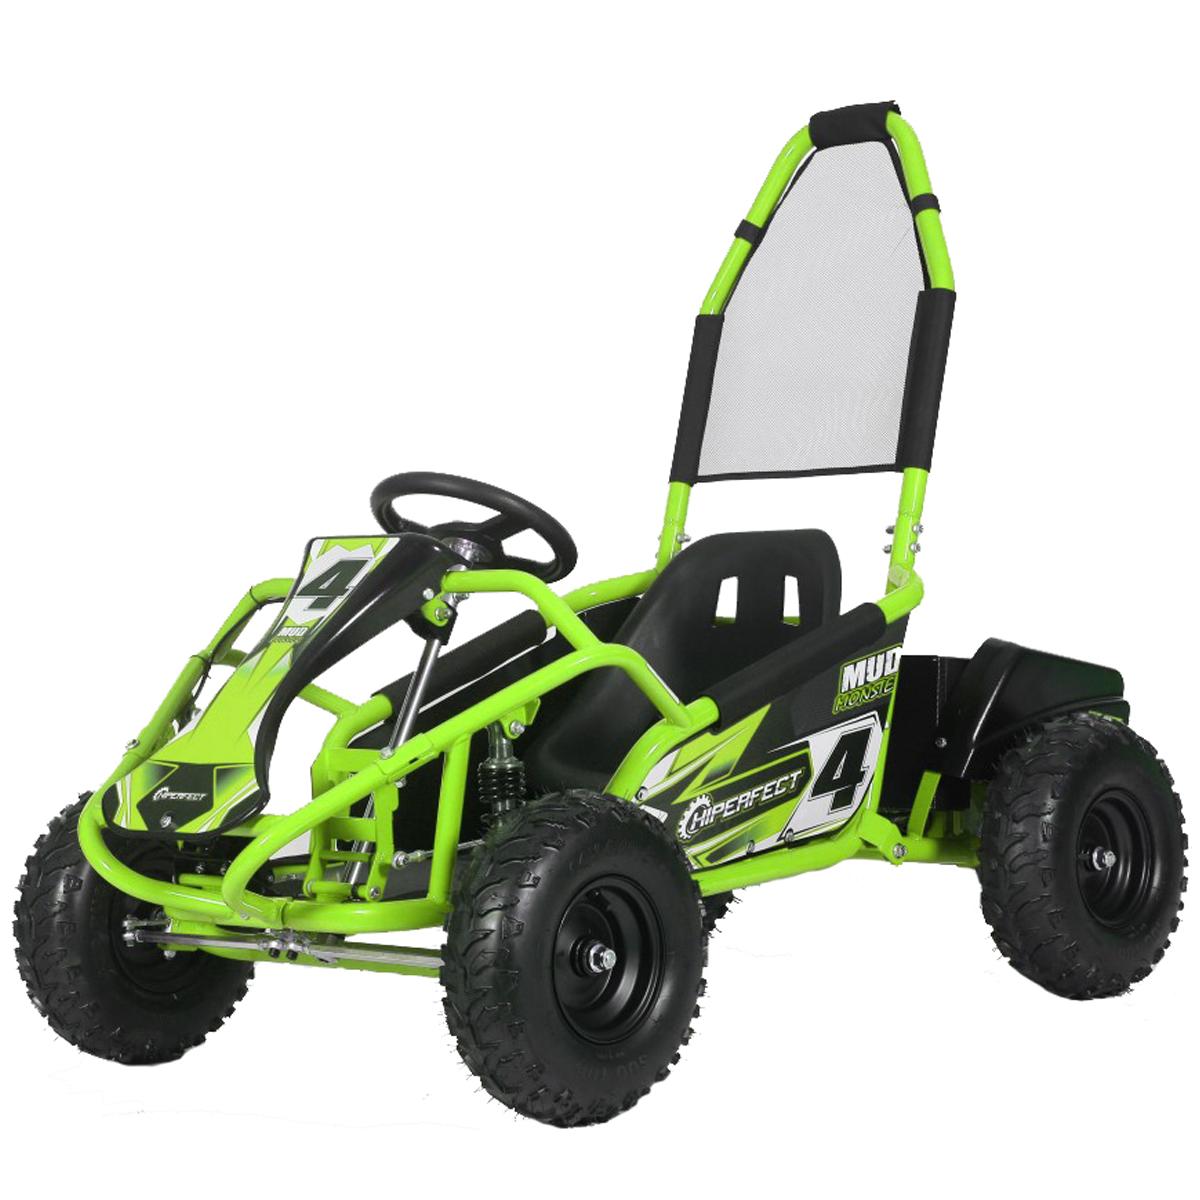 Green Mud Monster 1000w 20ah 48v Kids Electric Go Kart